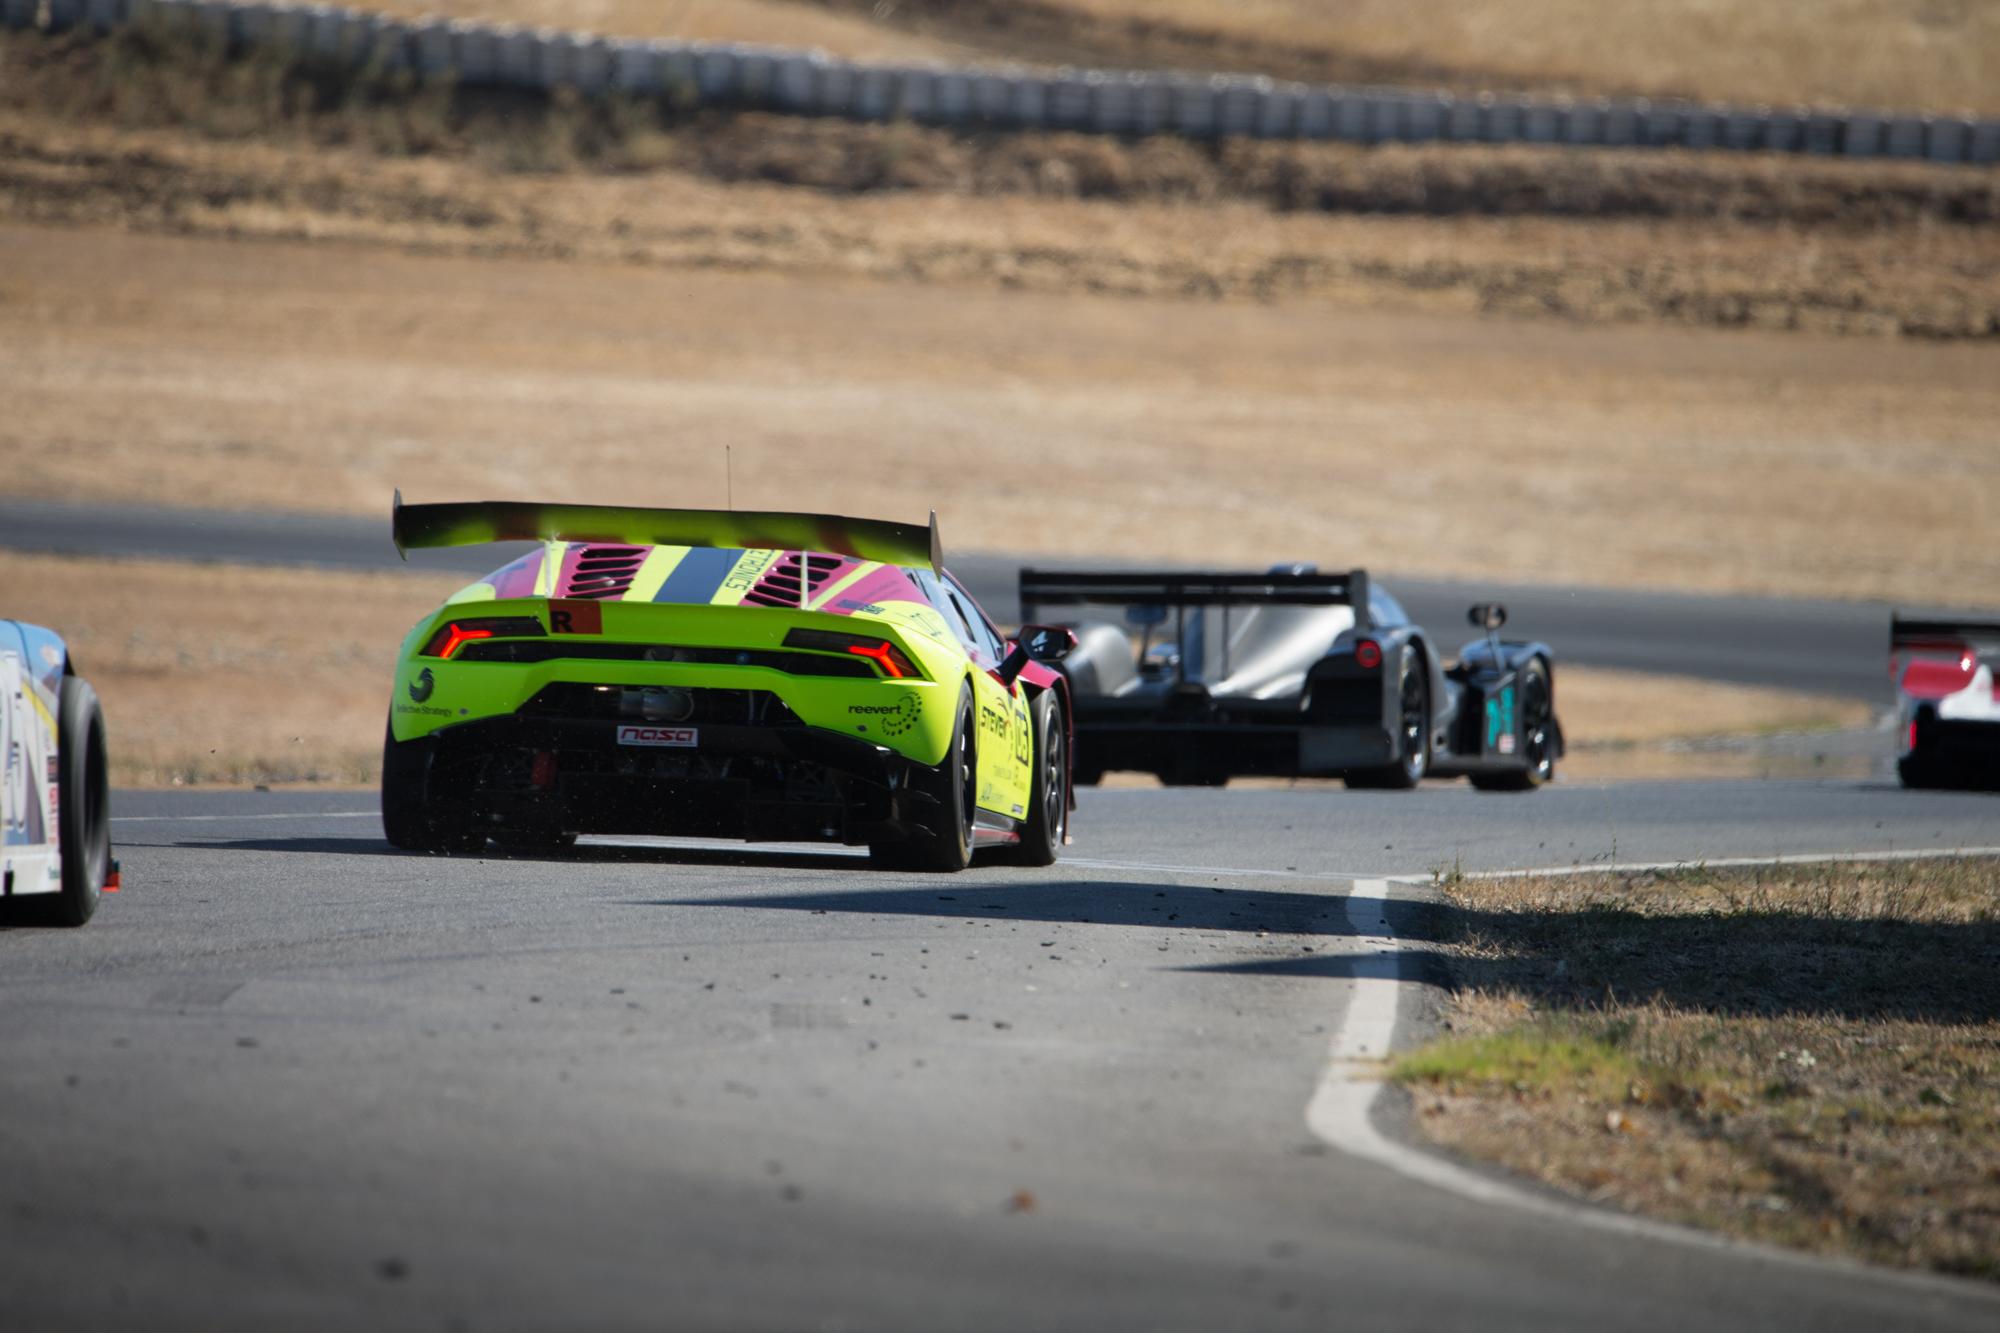 Steven-Racing-20171006-45112.jpg